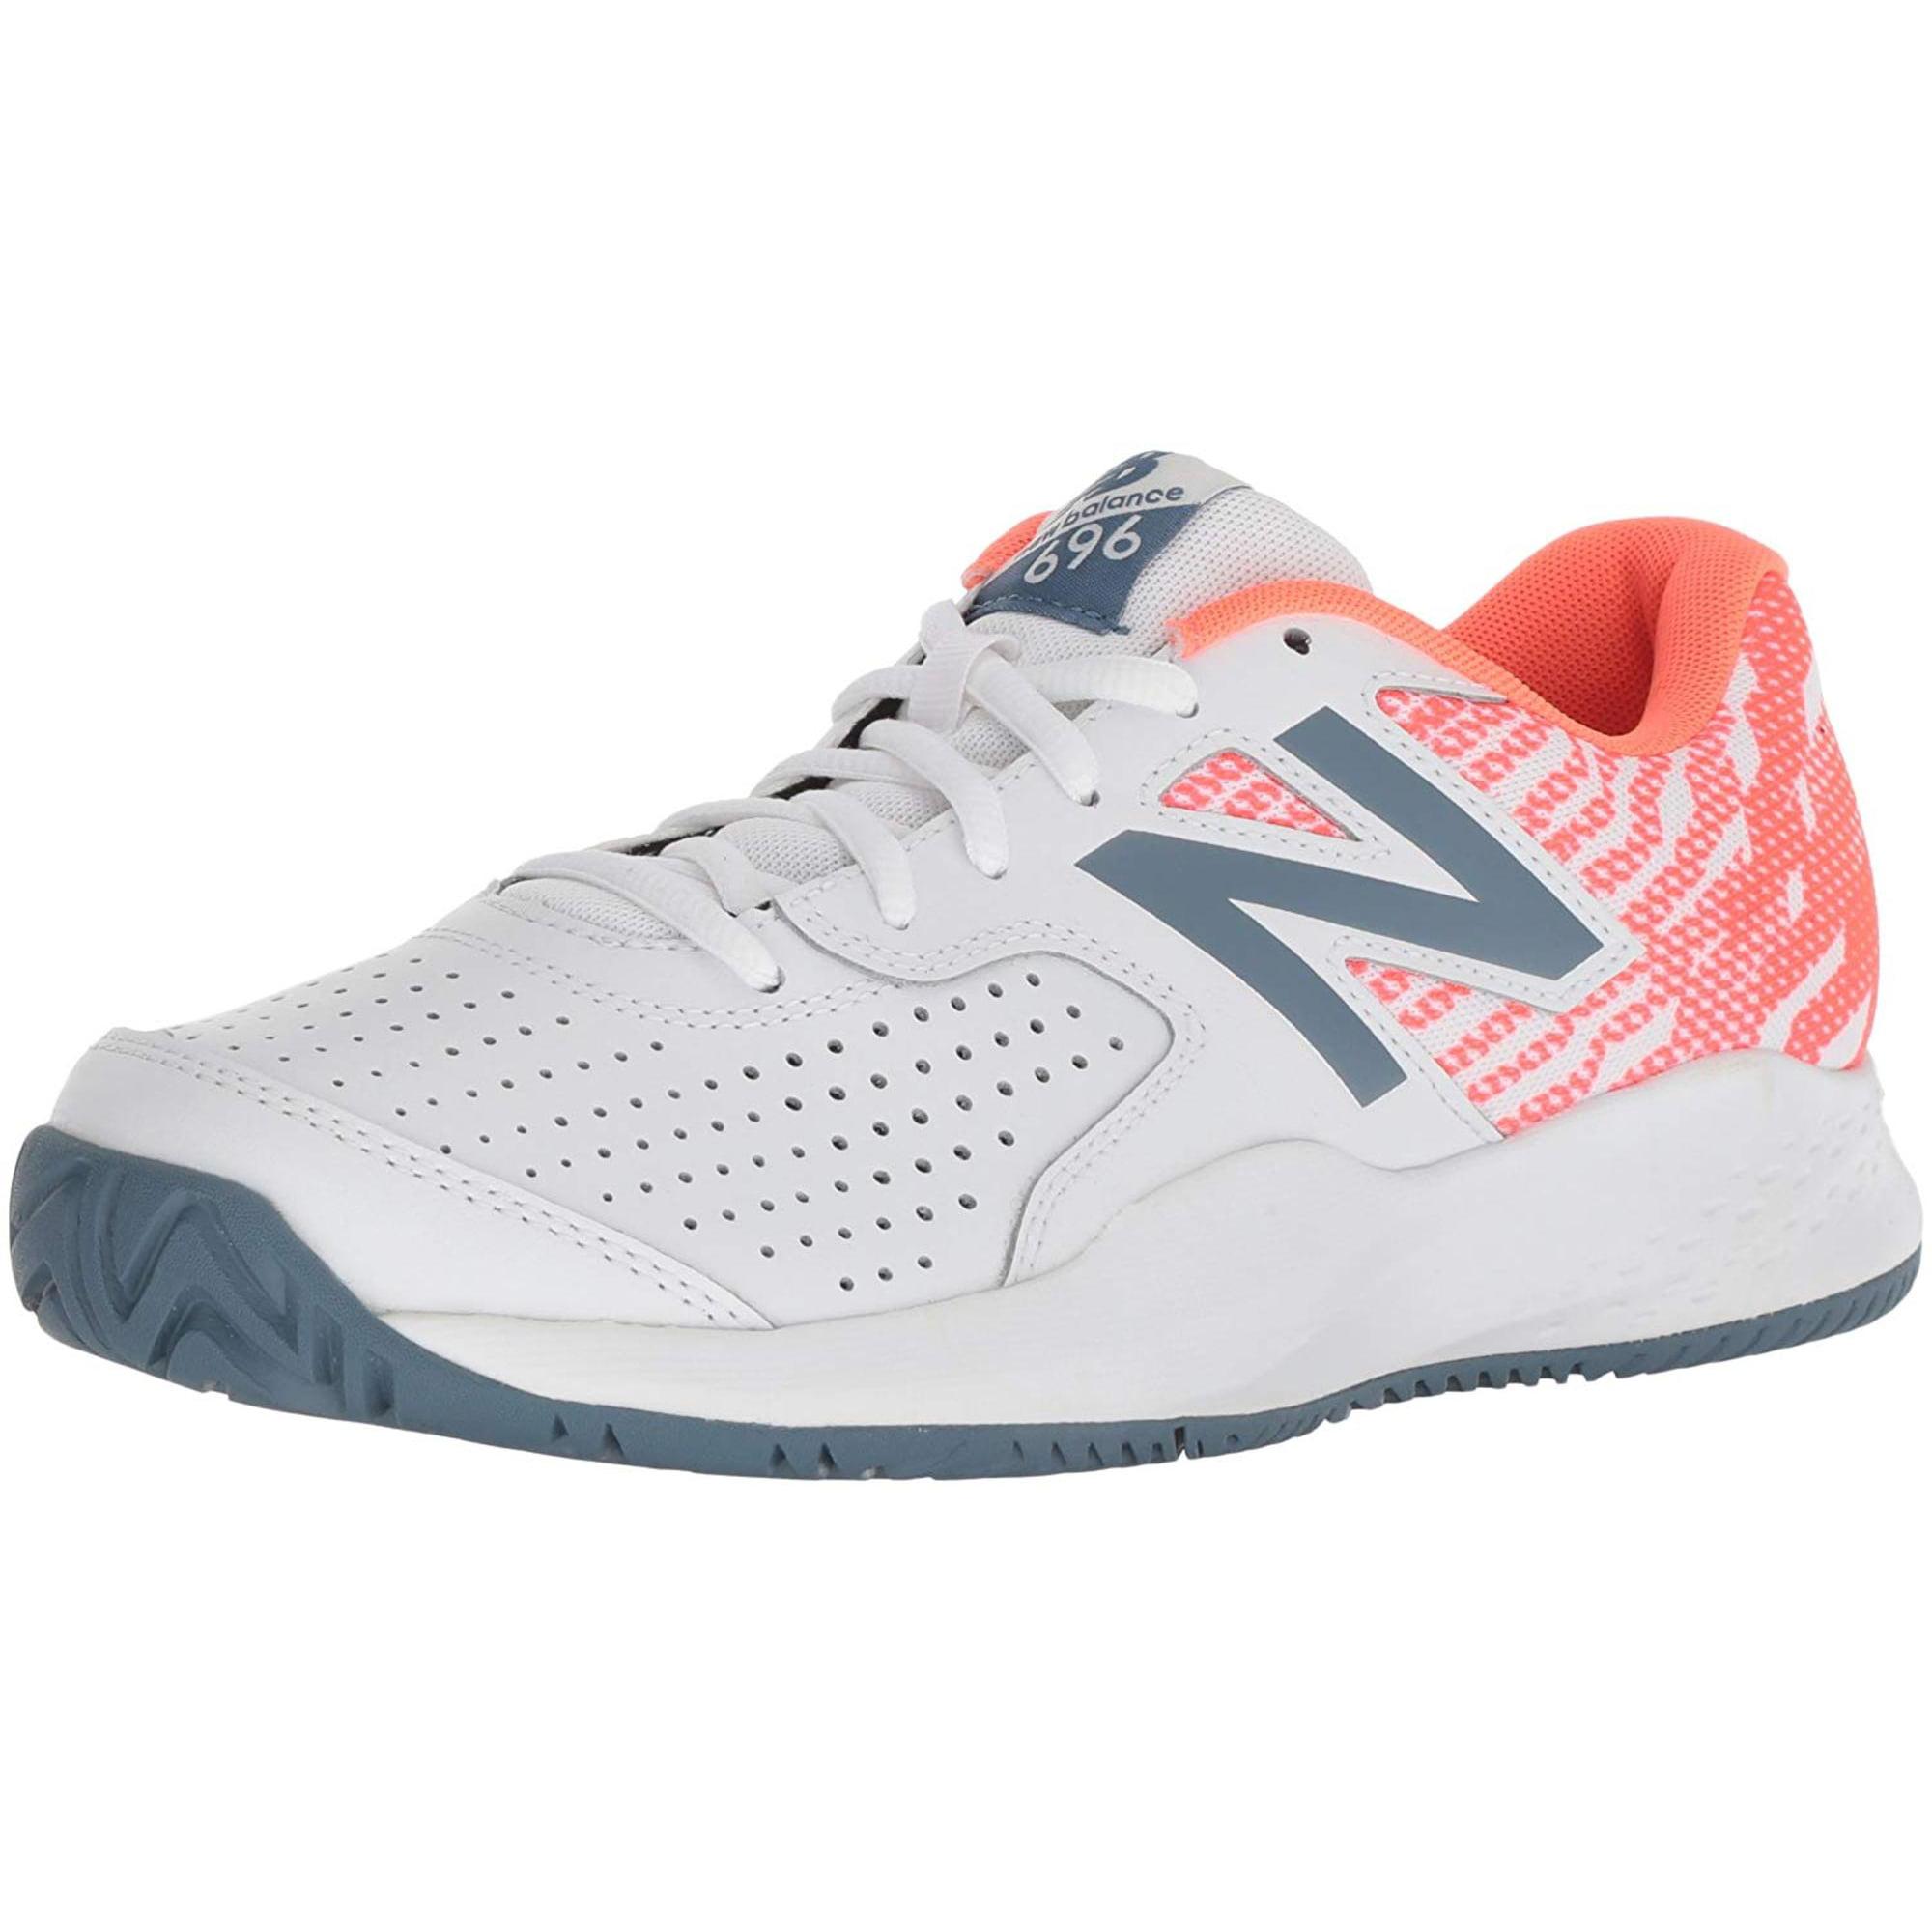 finest selection da08e cc5fa New Balance Womens 696v3 Low Top Lace Up Tennis Shoes ...